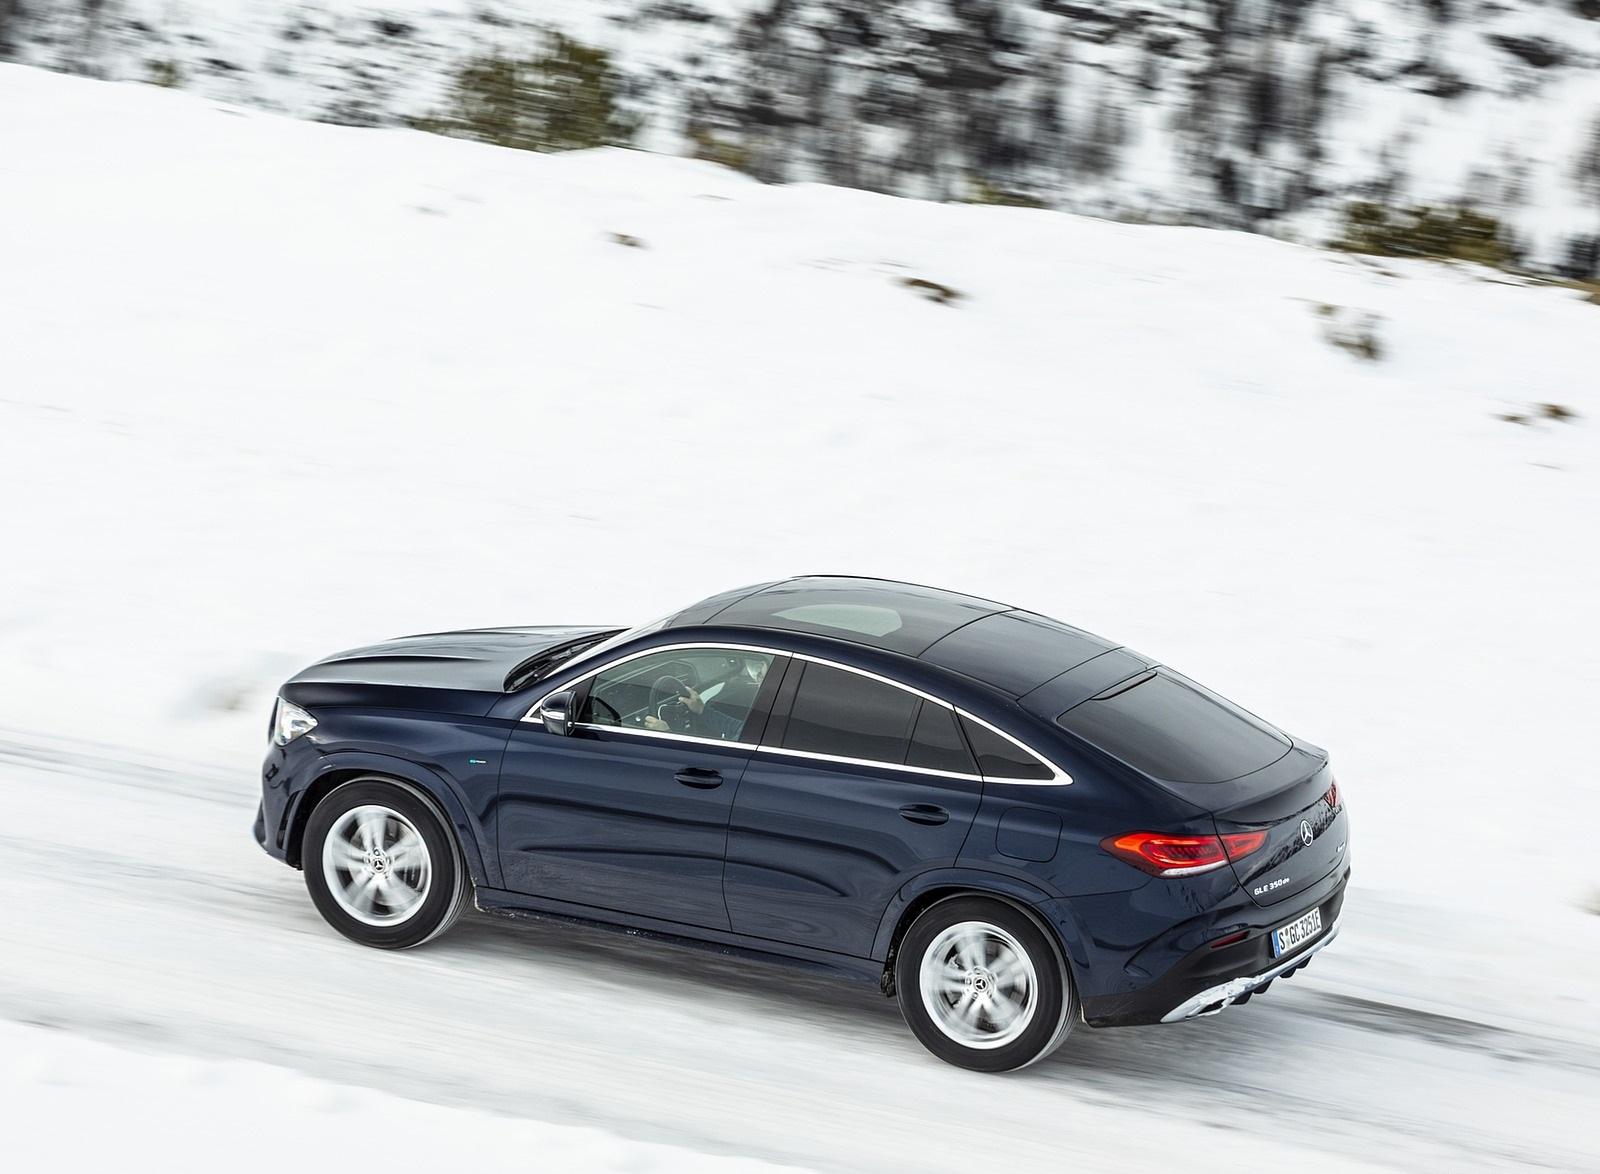 2021 Mercedes-Benz GLE Coupe 350 de 4MATIC Coupe (Color: Cavansite Blue Metallic Diesel Plug-In Hybrid) Rear Three-Quarter Wallpapers (8)